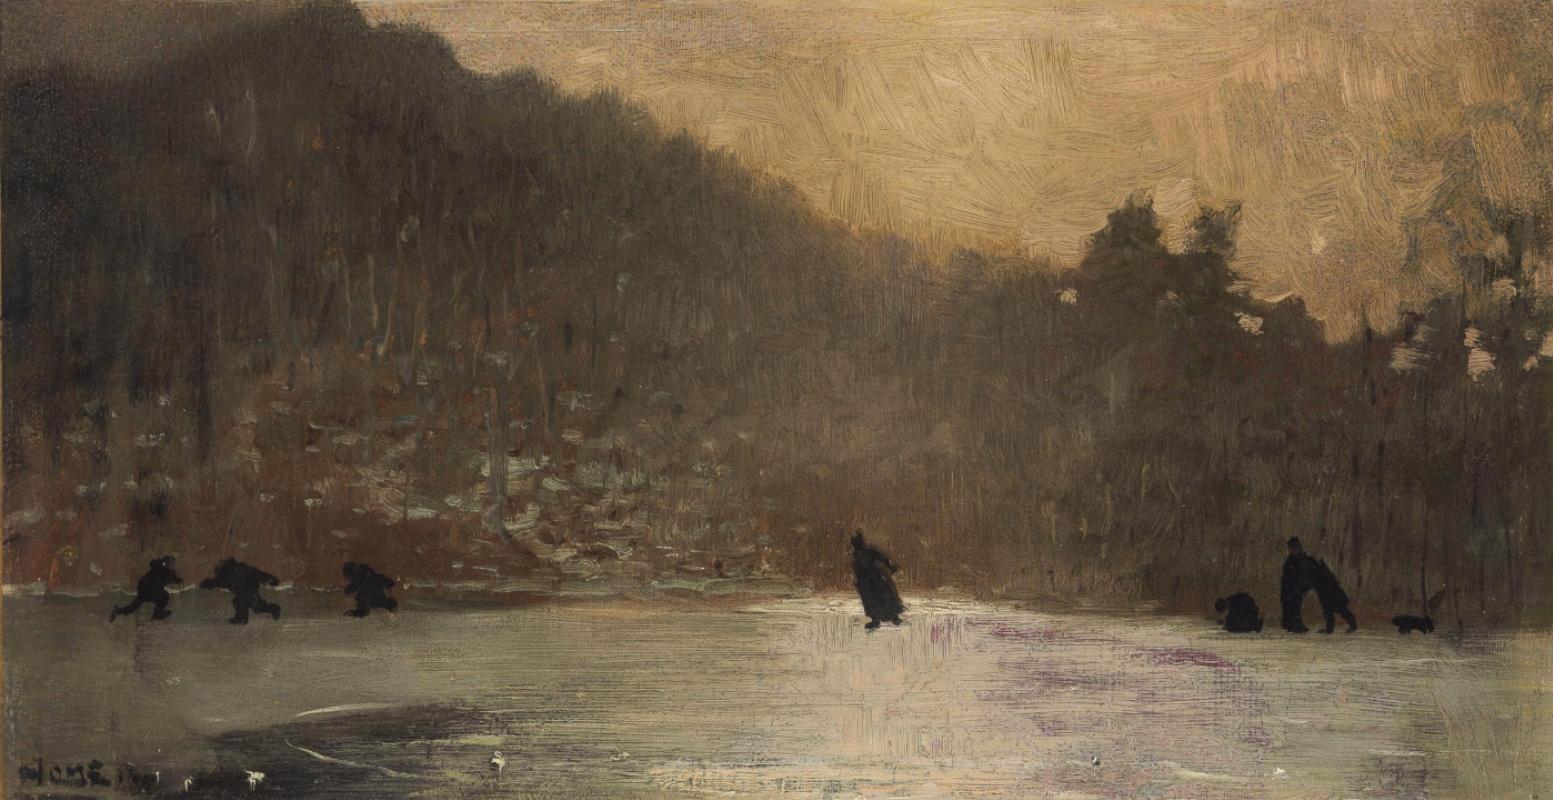 Winslow Homer. Skating